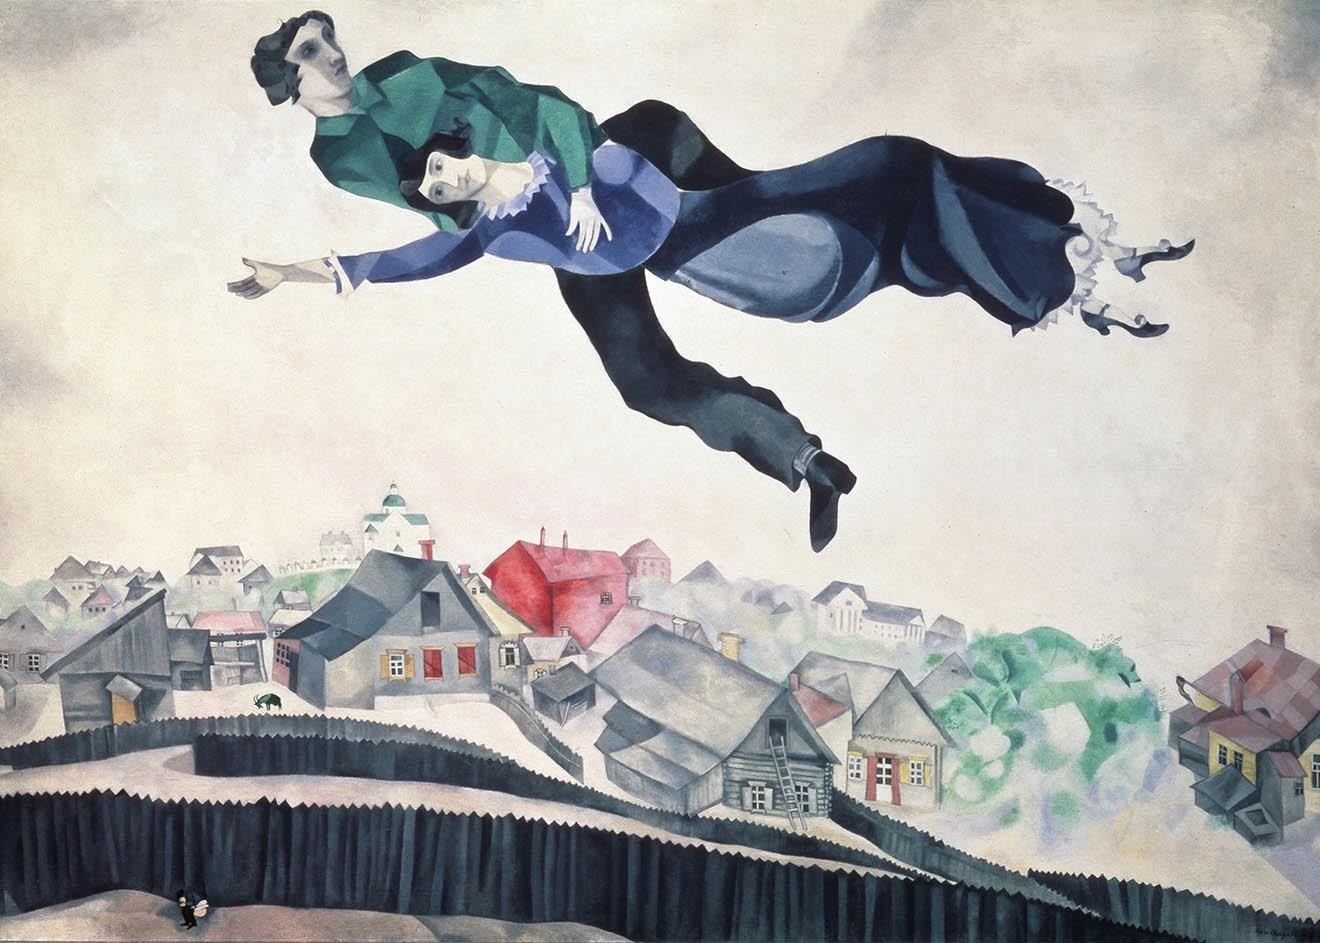 Над городом. Картина Марка Шагала. 1914–1918 годы / Государственная Третьяковская галерея / © Fine Art Images / Diomedia